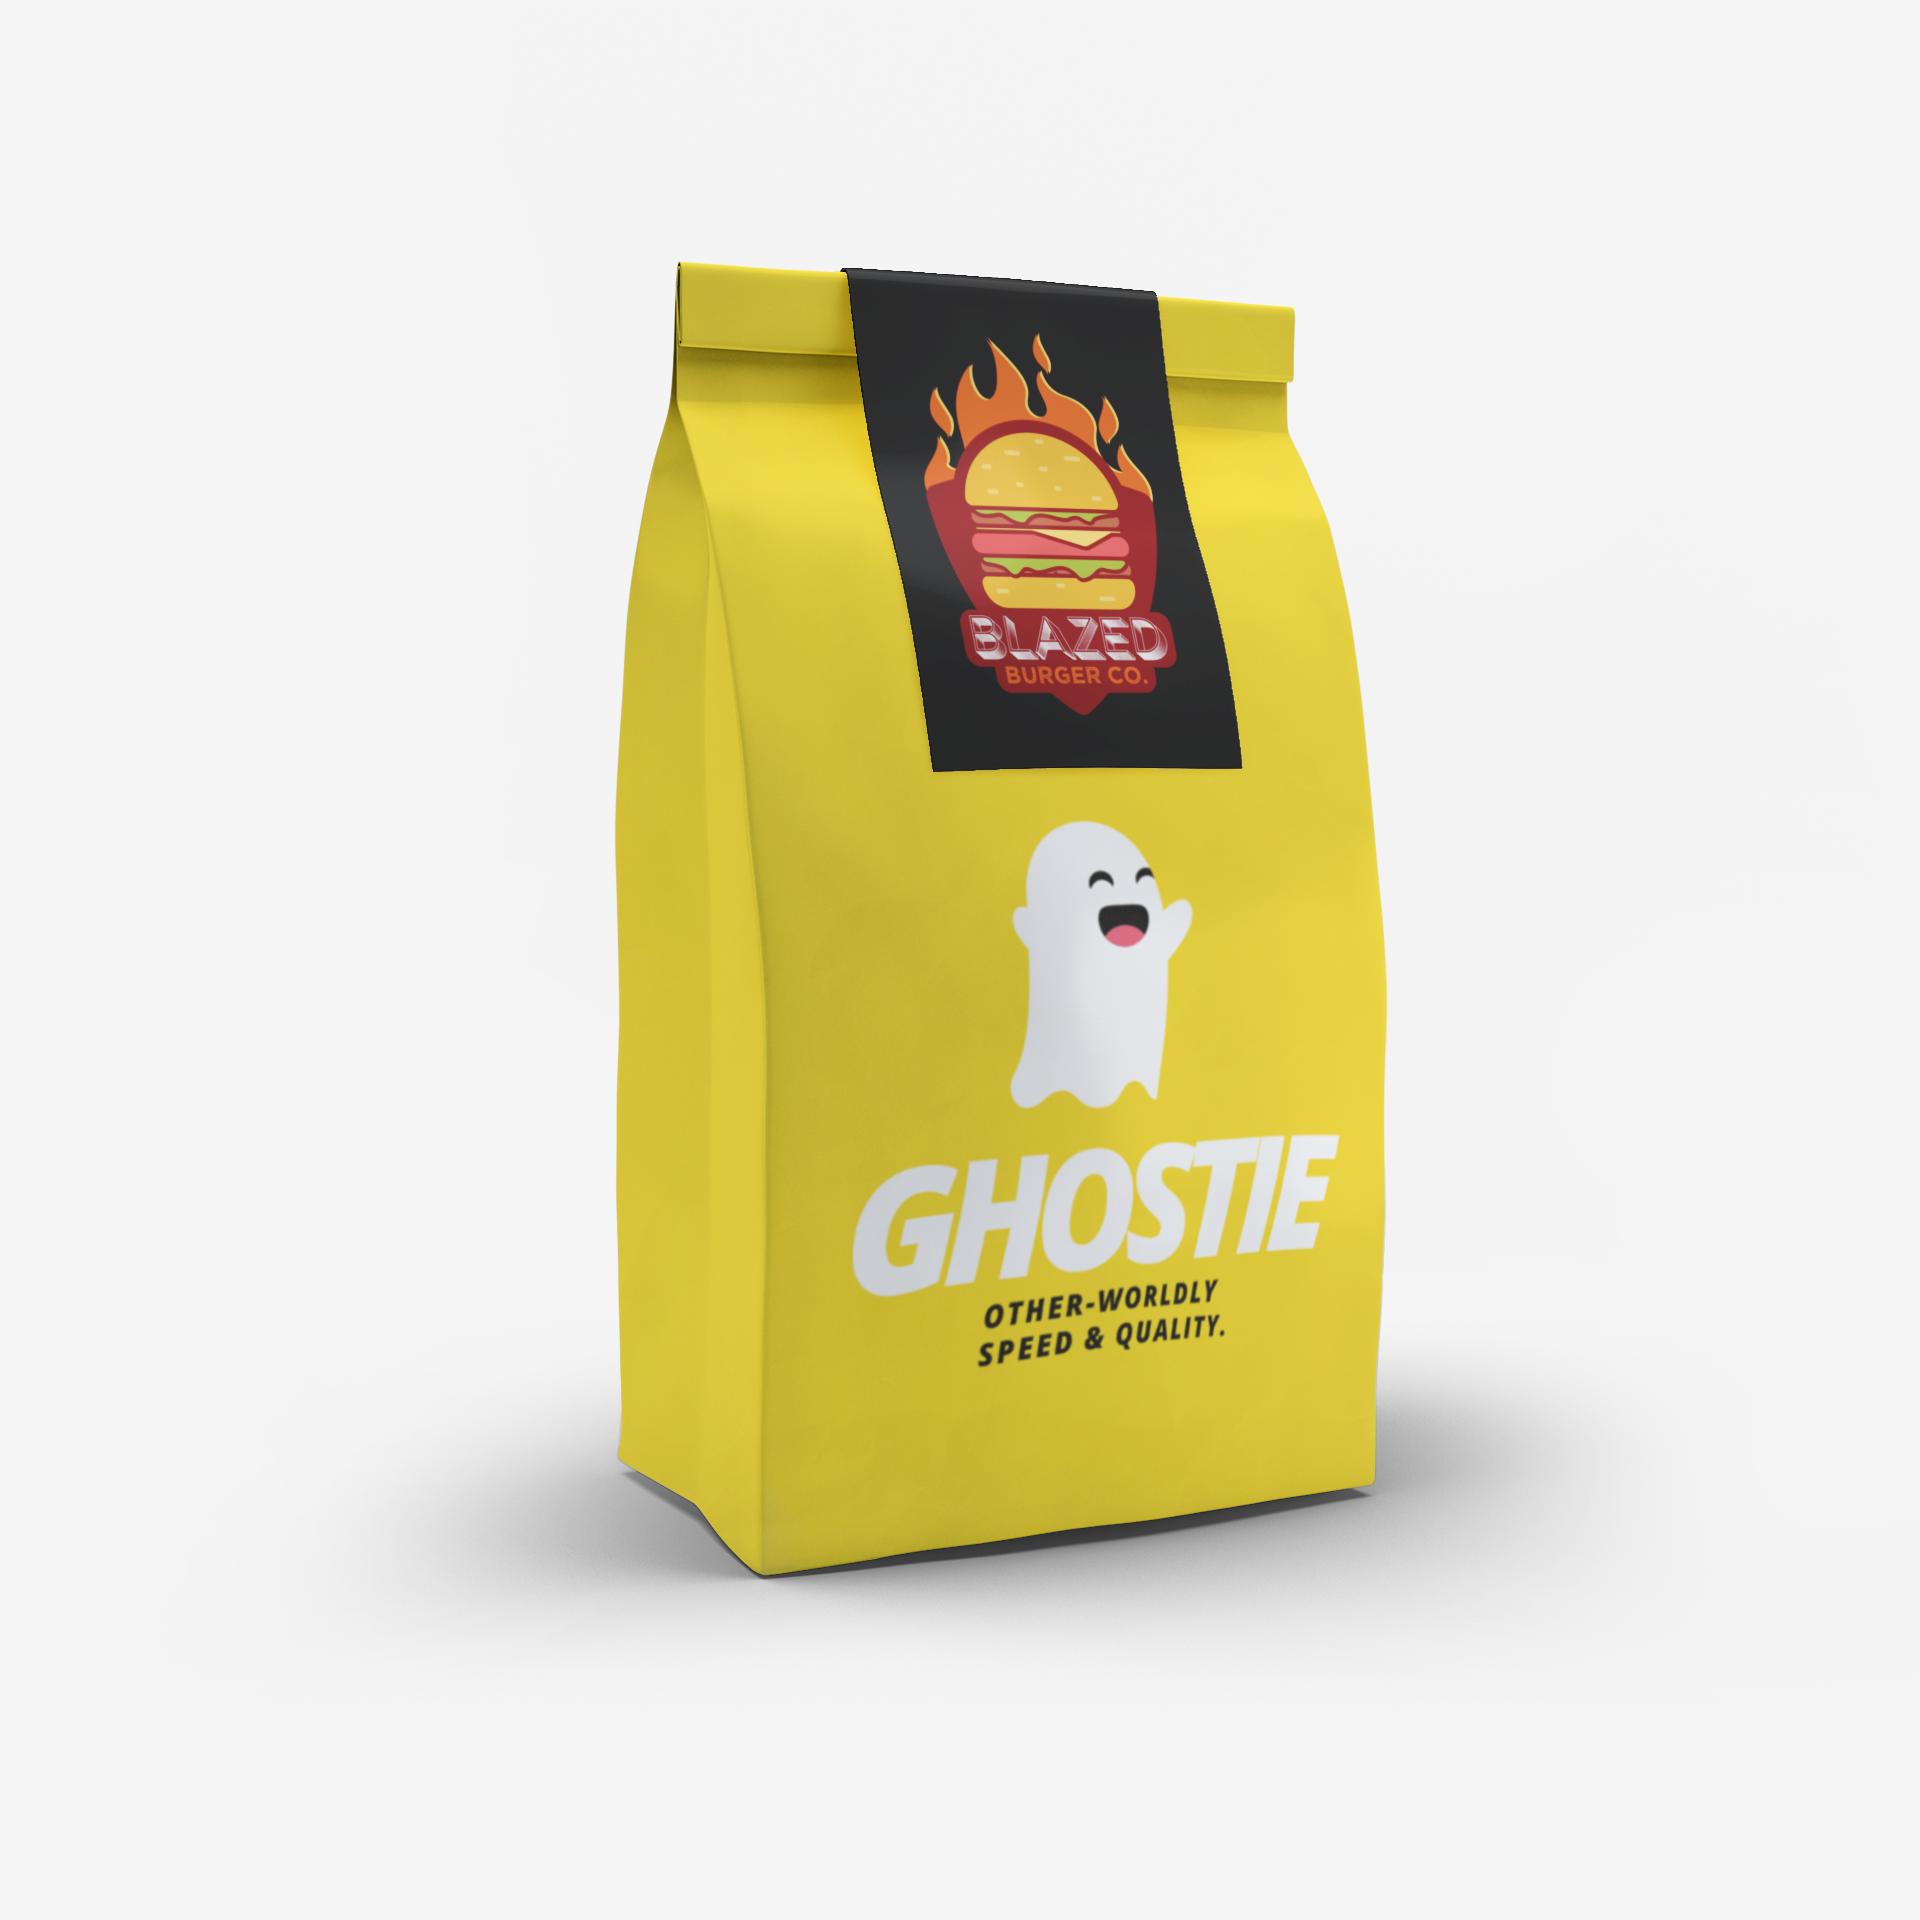 Ghostie & Blazed Burgers